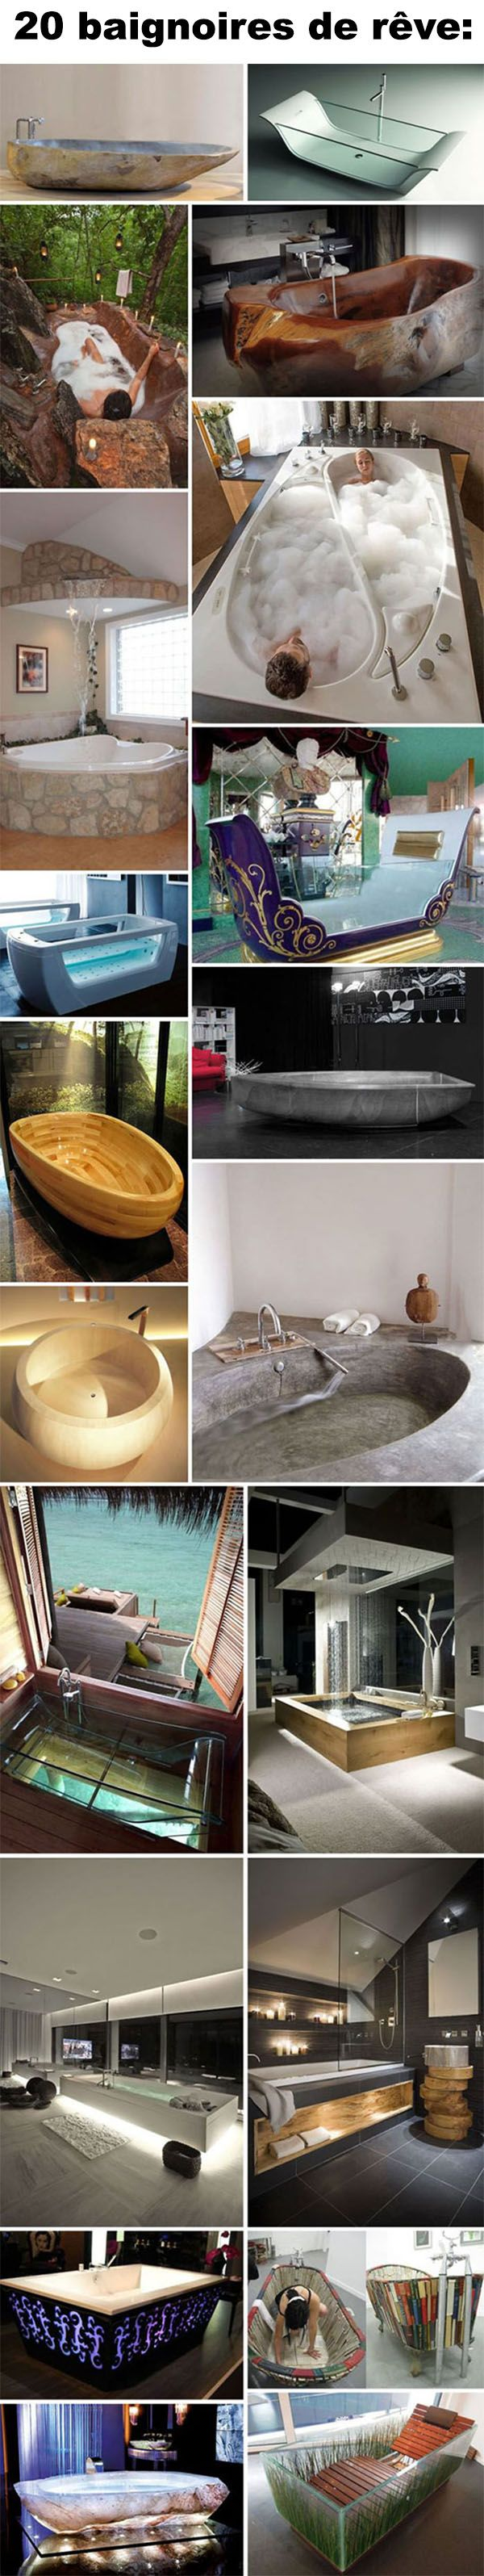 20 baignoires de rêve